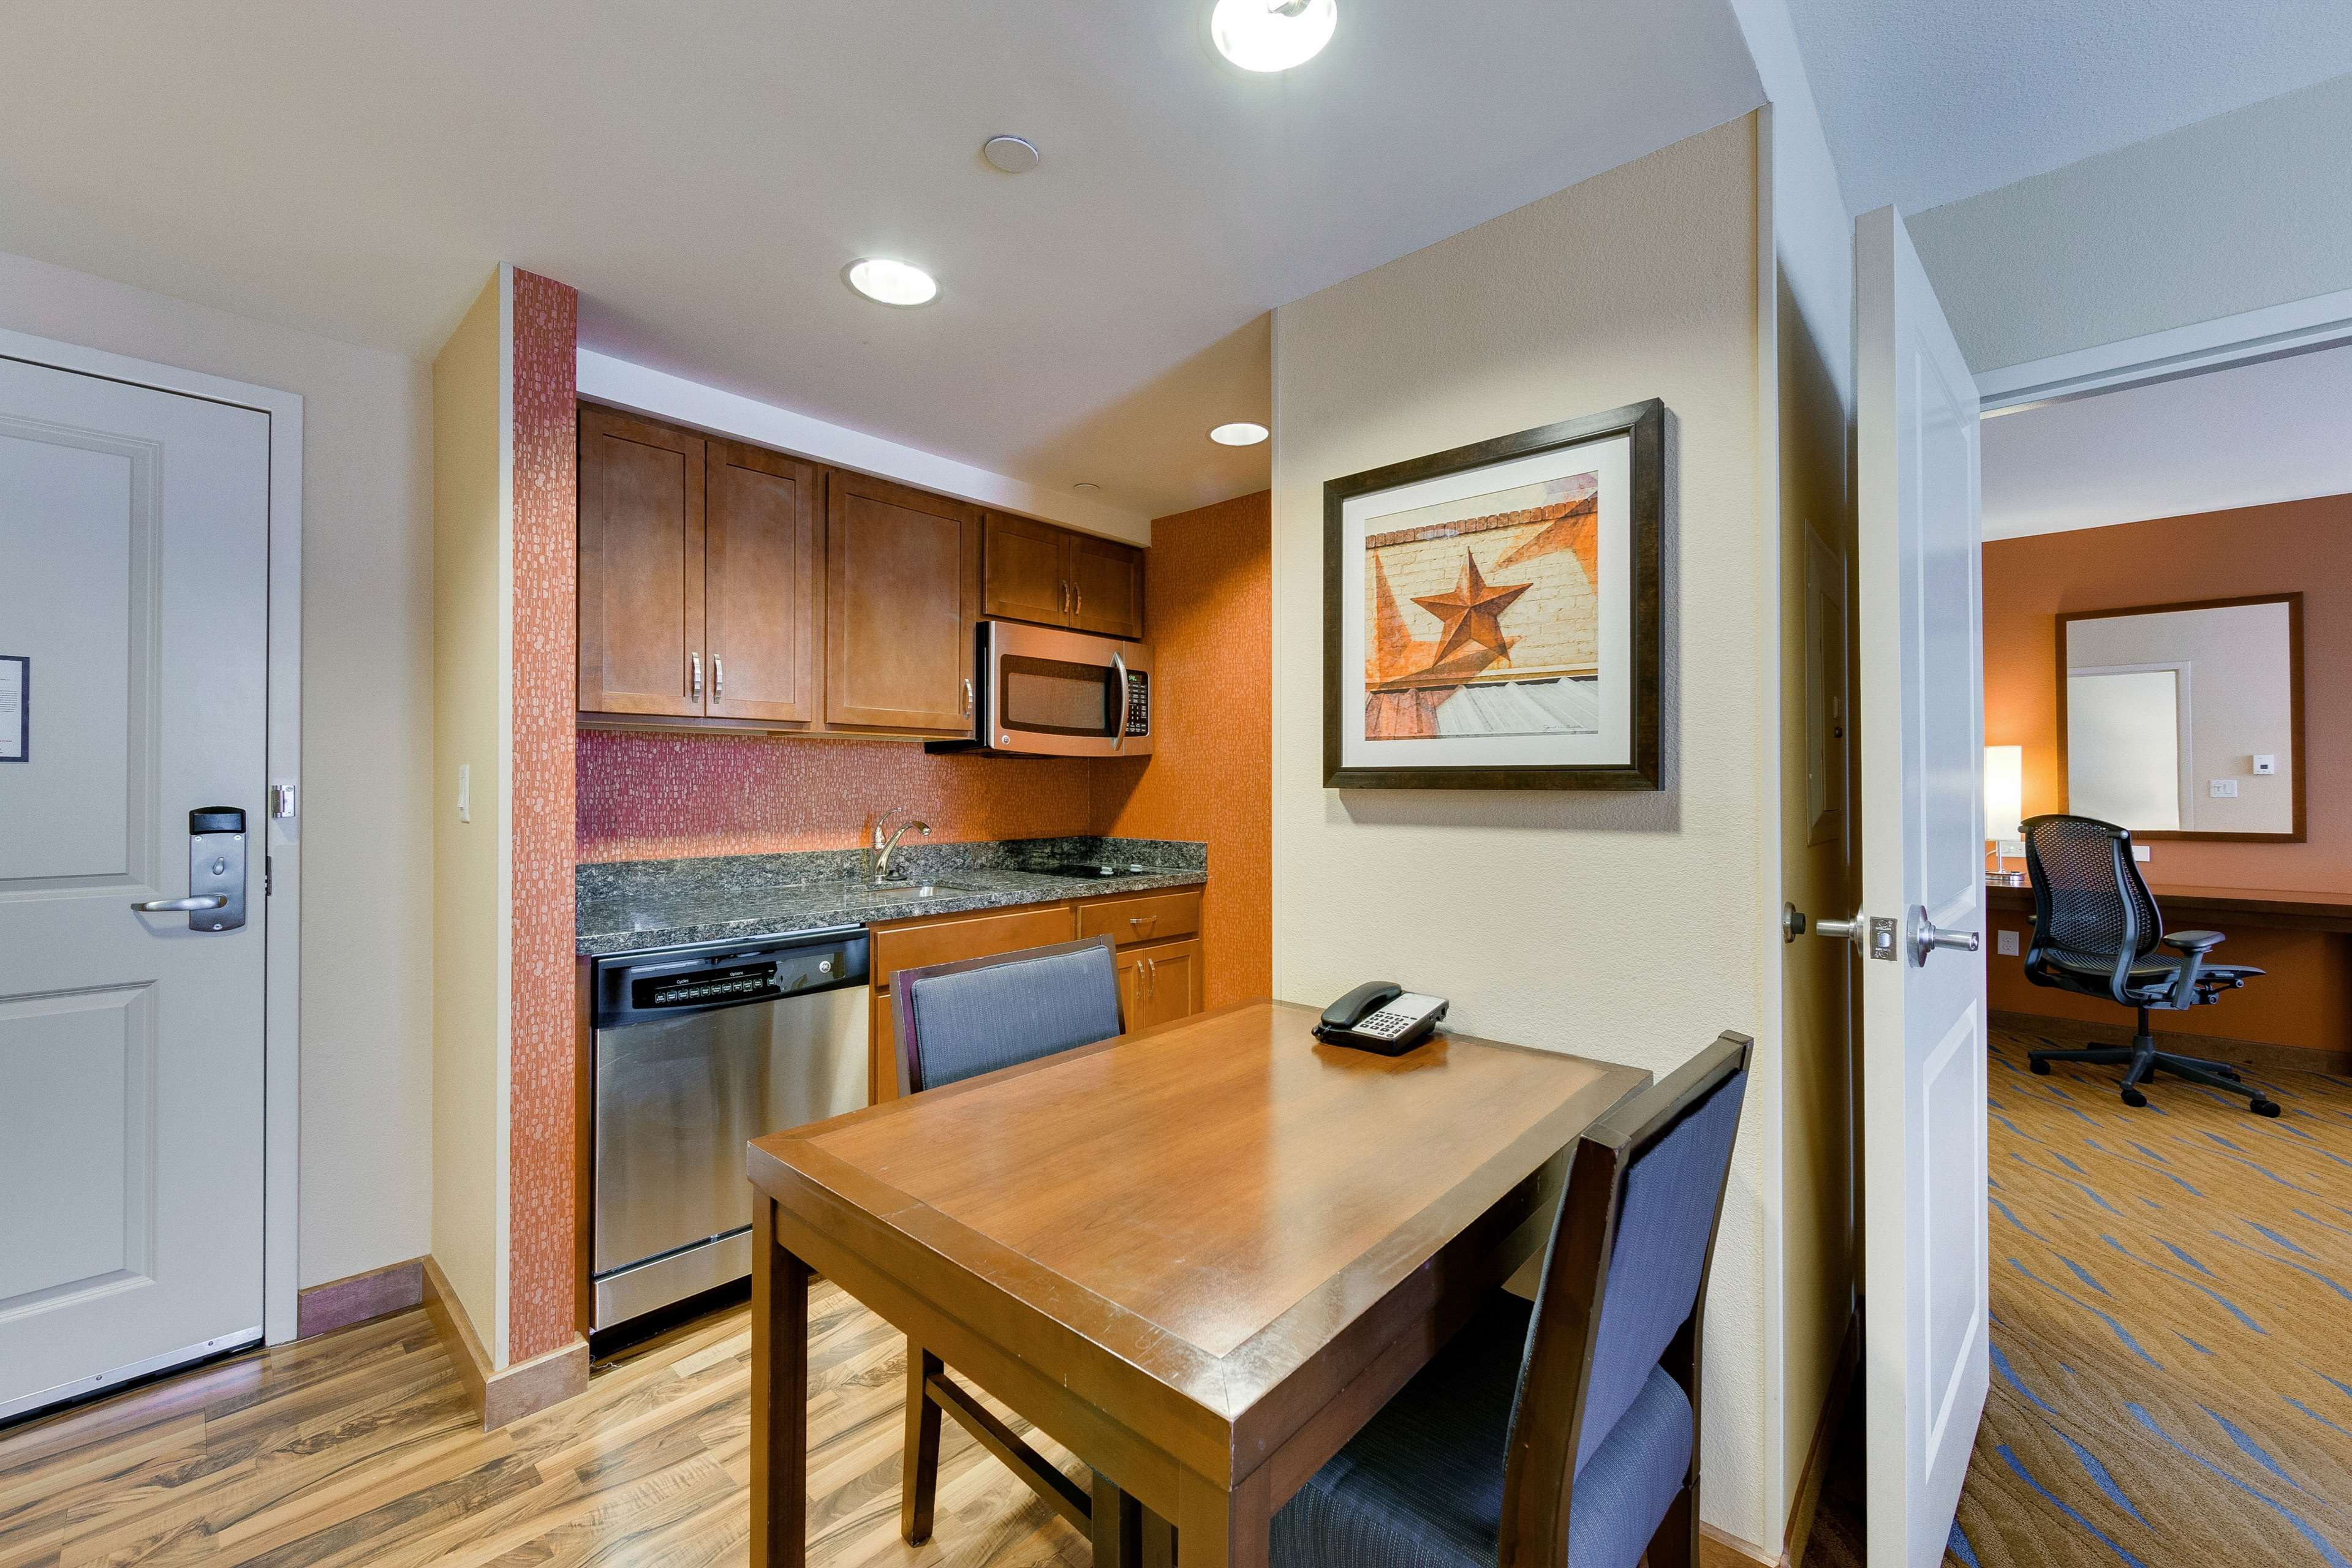 Homewood Suites by Hilton Fort Worth - Medical Center, TX image 10